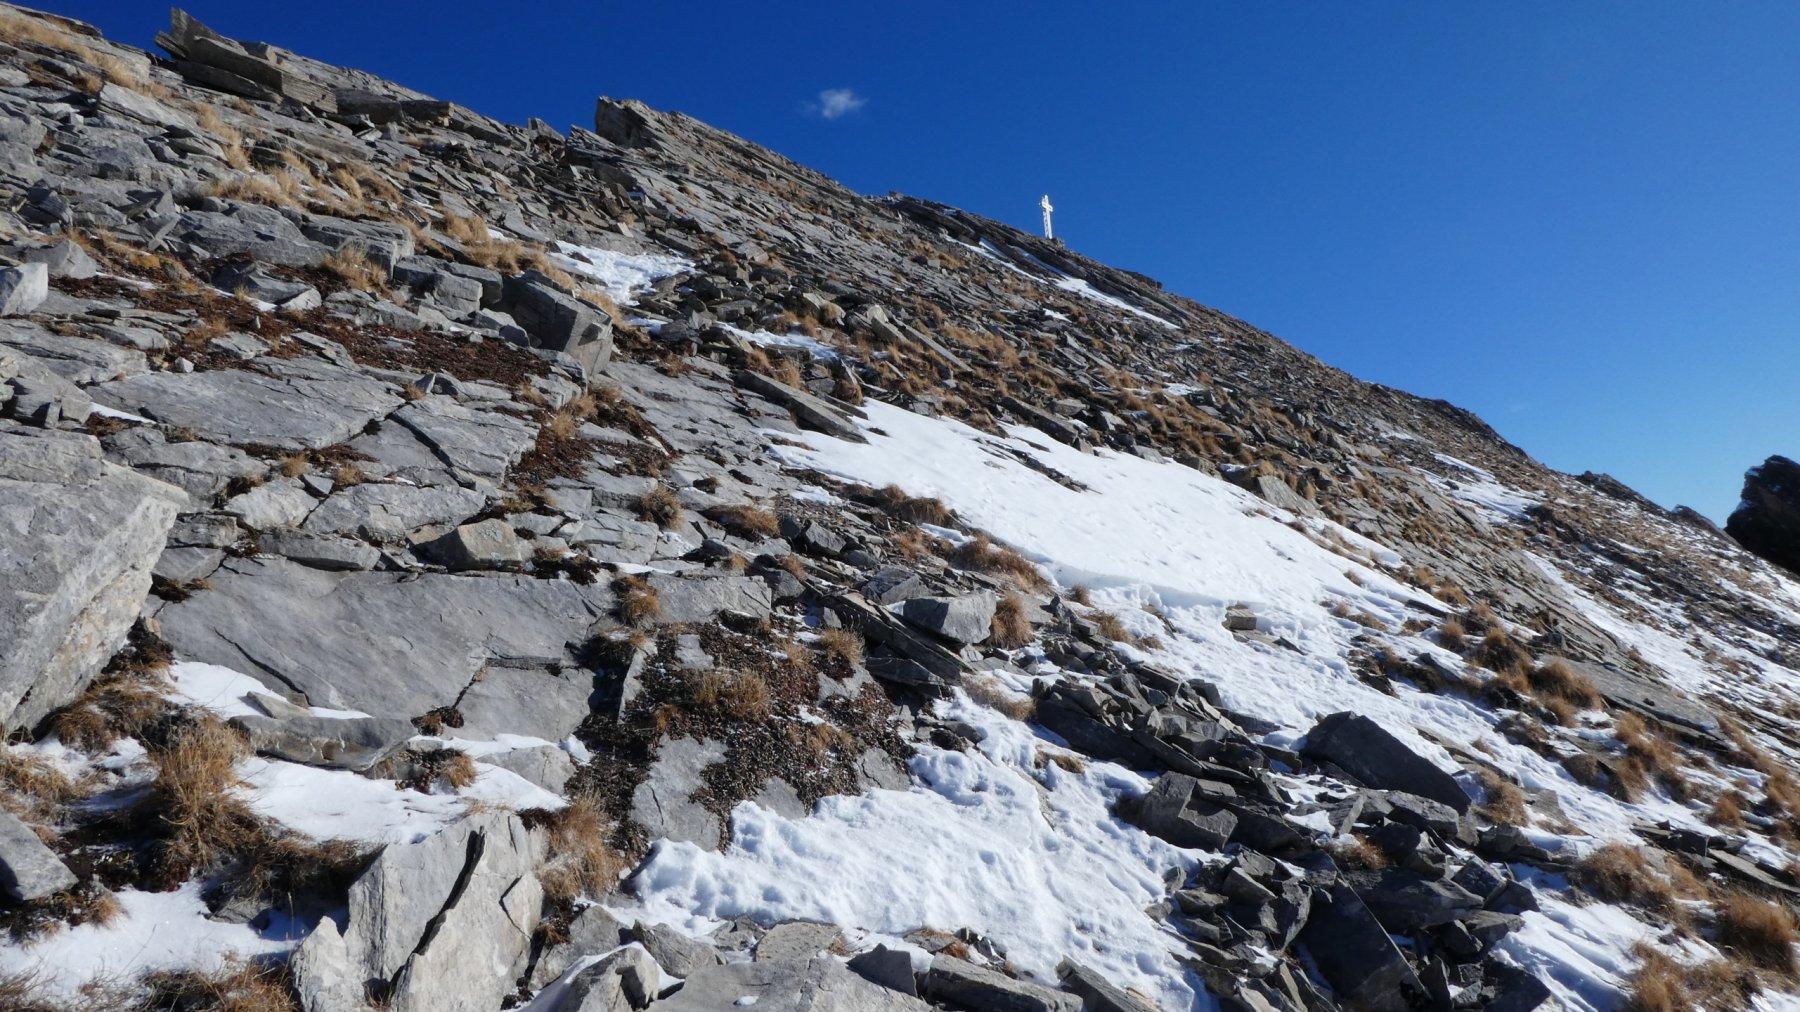 la parte finale del versante Ovest del Monte Pence